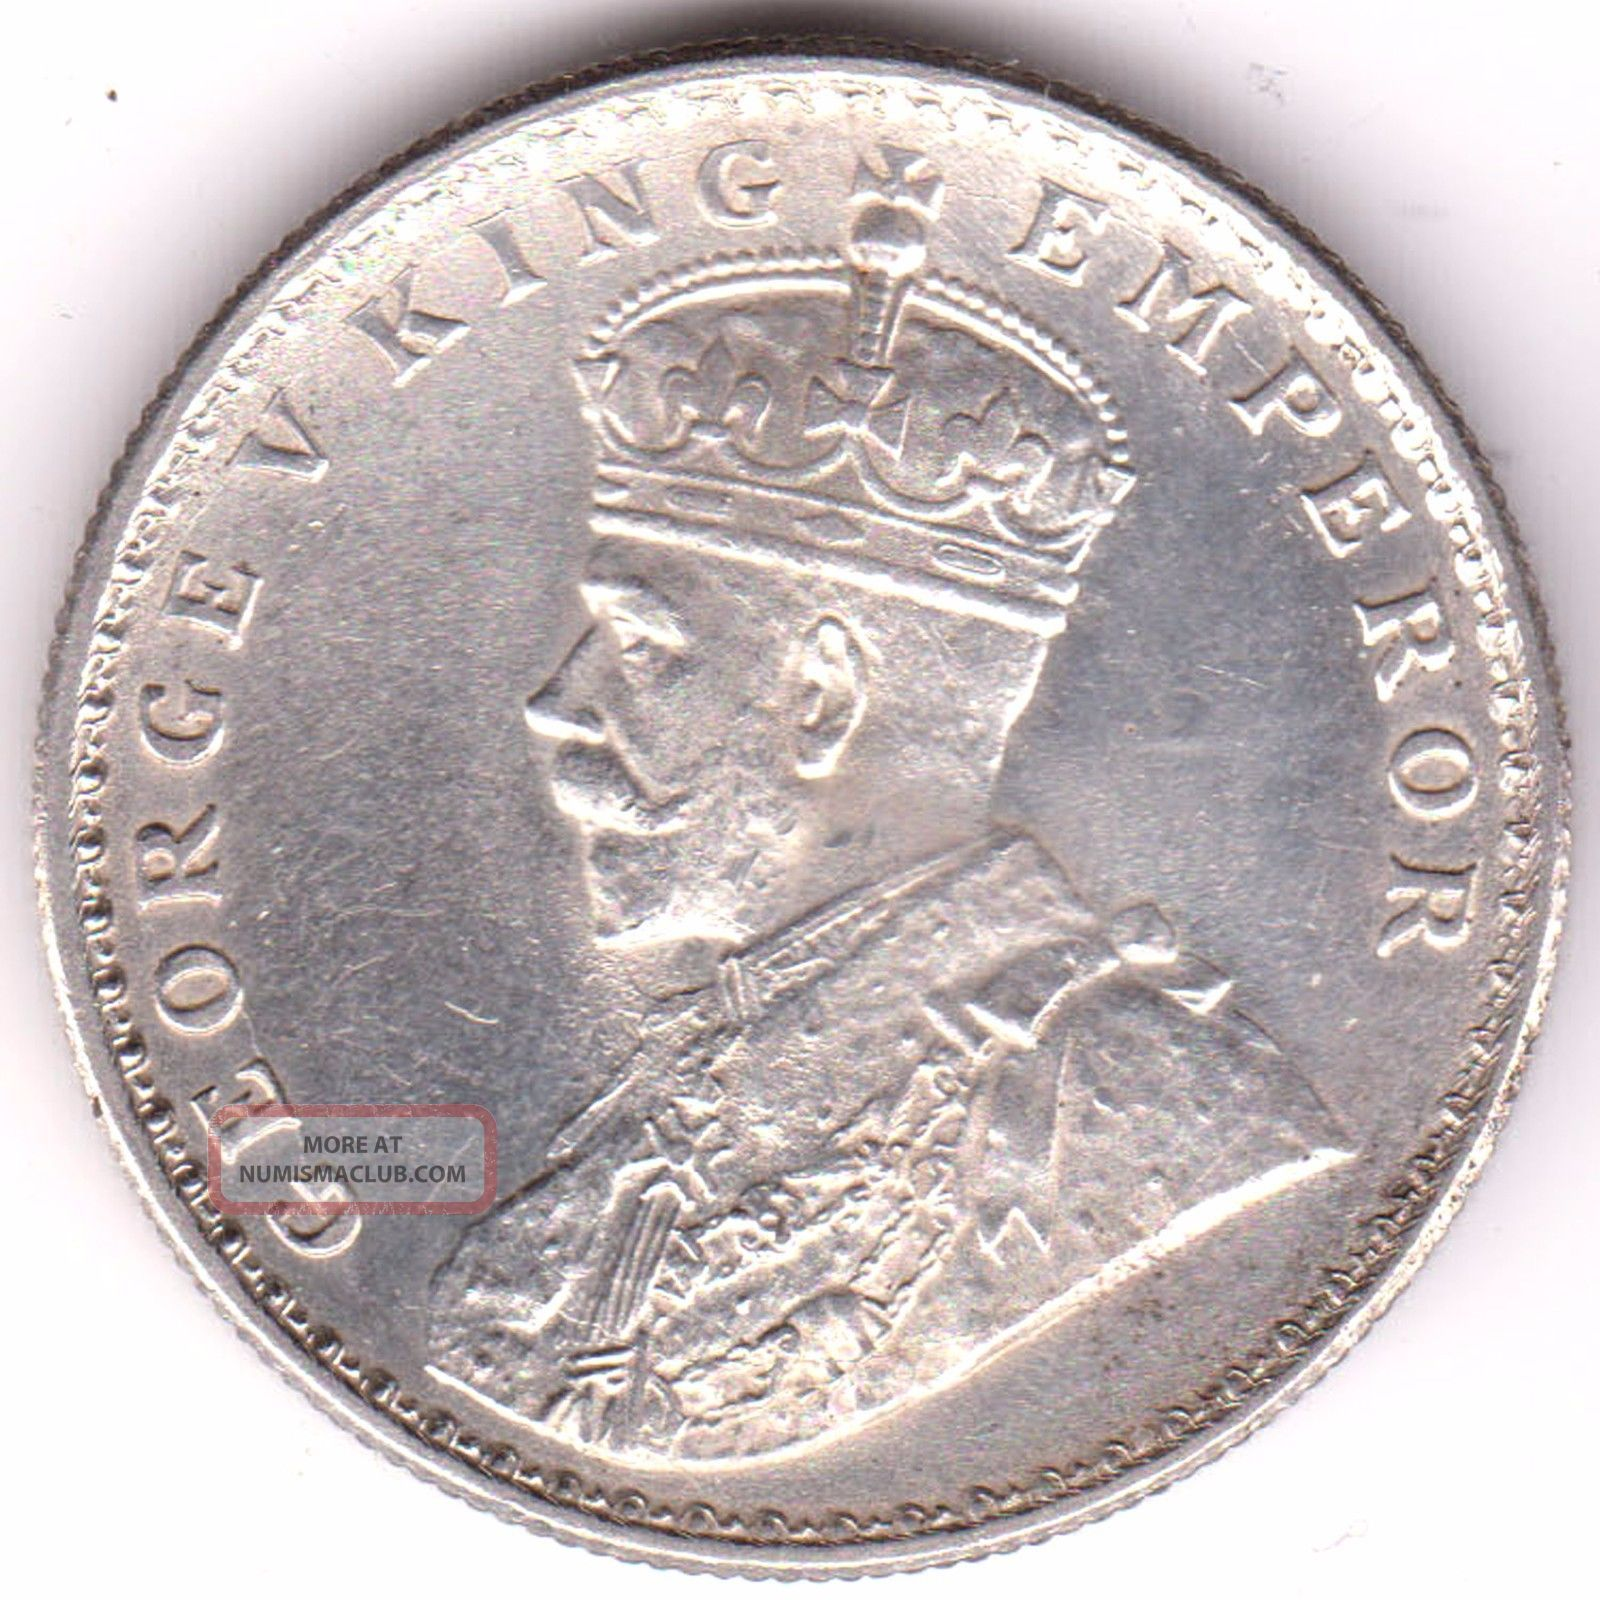 British India 1919 King George 5 One Rupee Rare Silver Coin 11 British photo